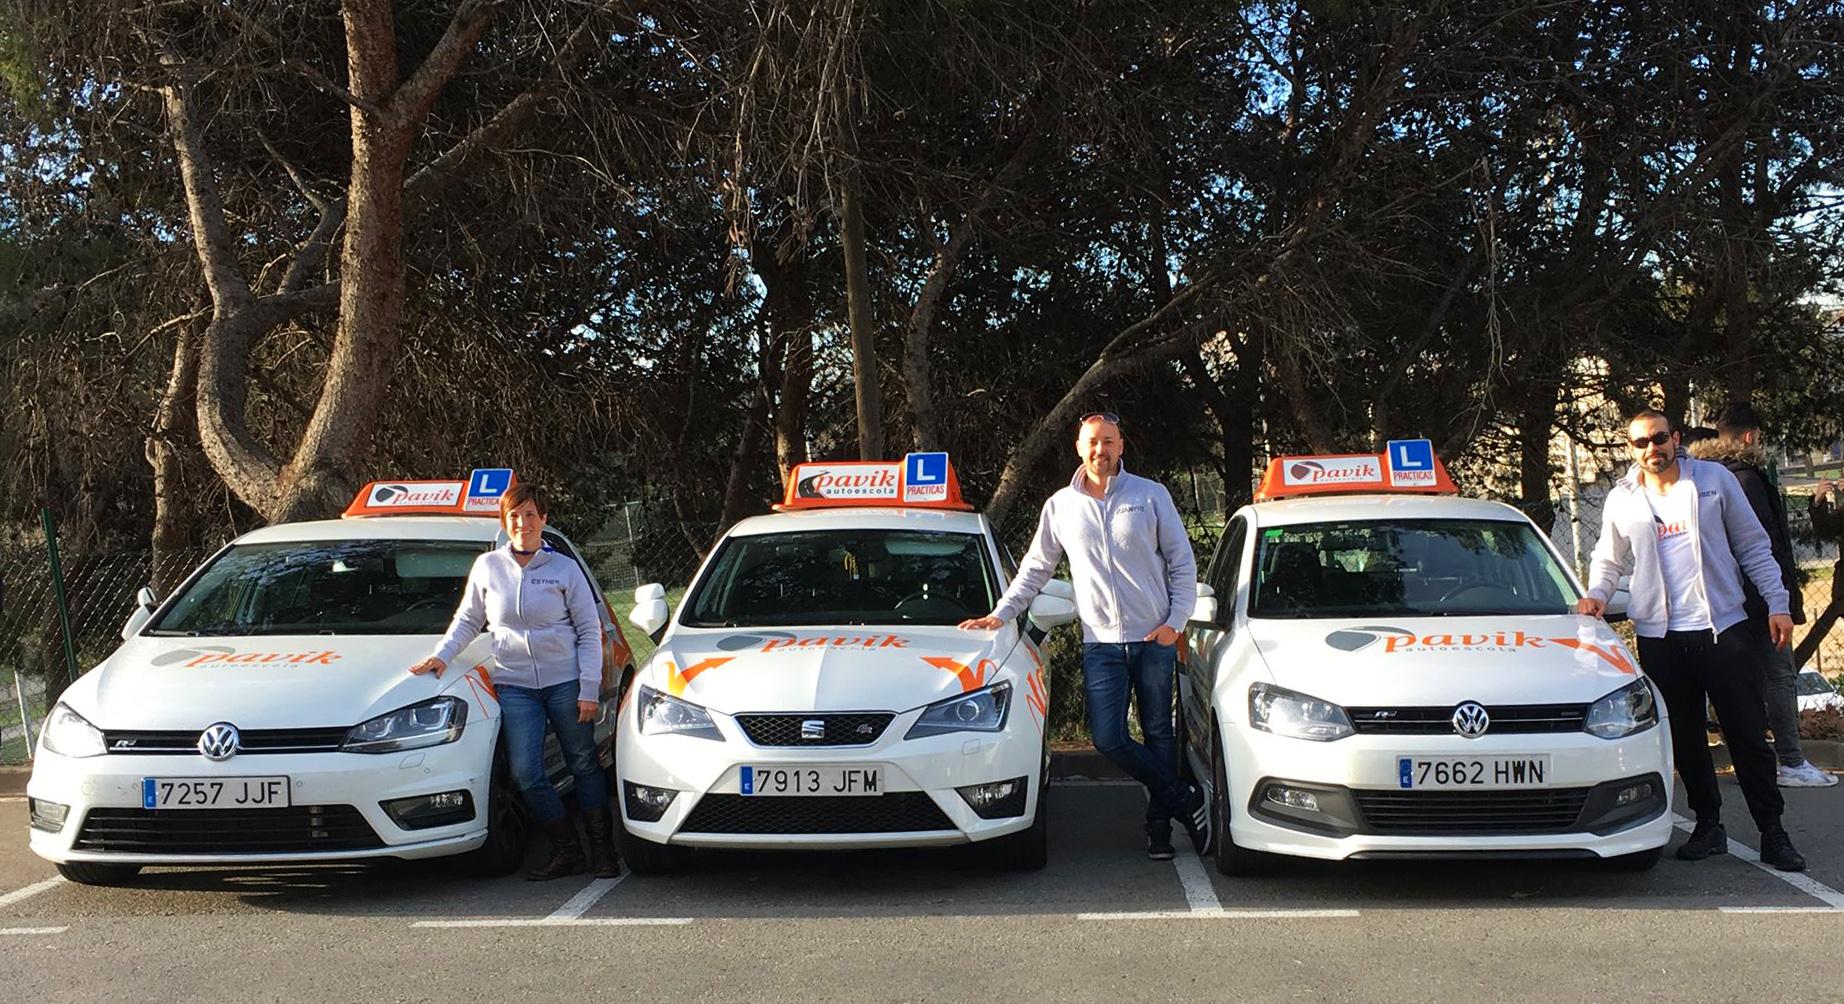 Curso intensivo de conducir en Hospitalet de Llobregat